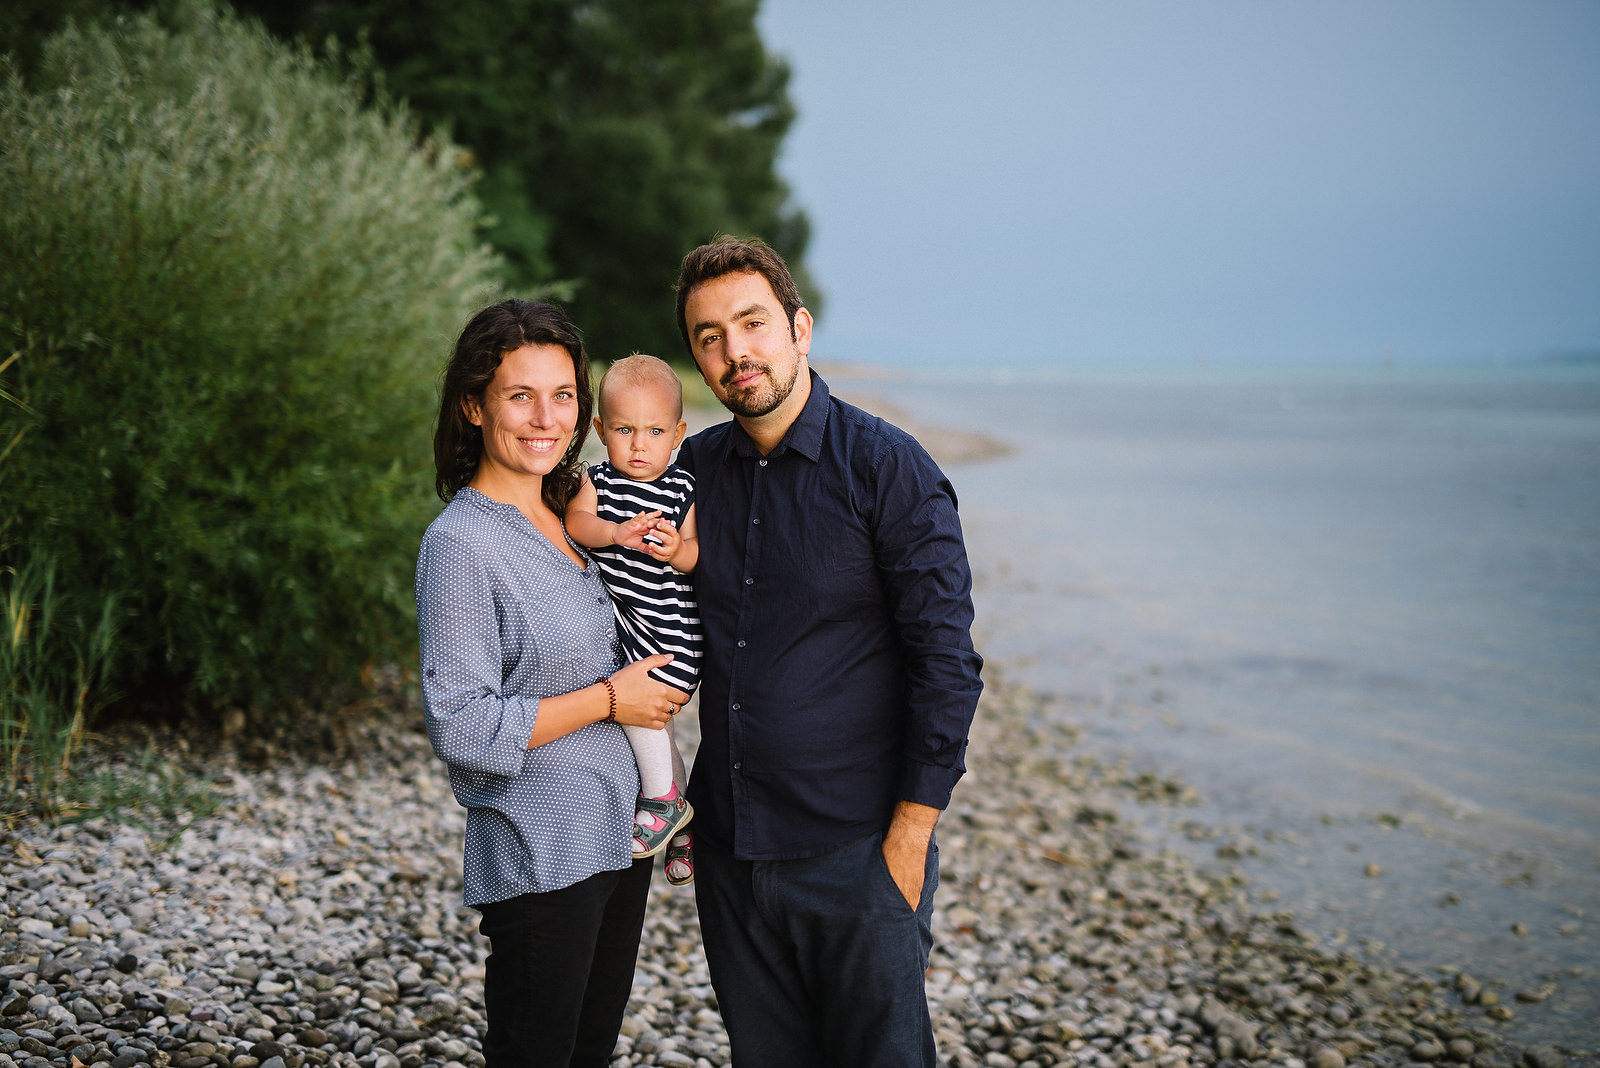 Fotograf Konstanz - Familienbilder Familien Musiker Baby Paar Shooting Konstanz EFP 02 - Family-Shooting at Lake Constance  - 2 -